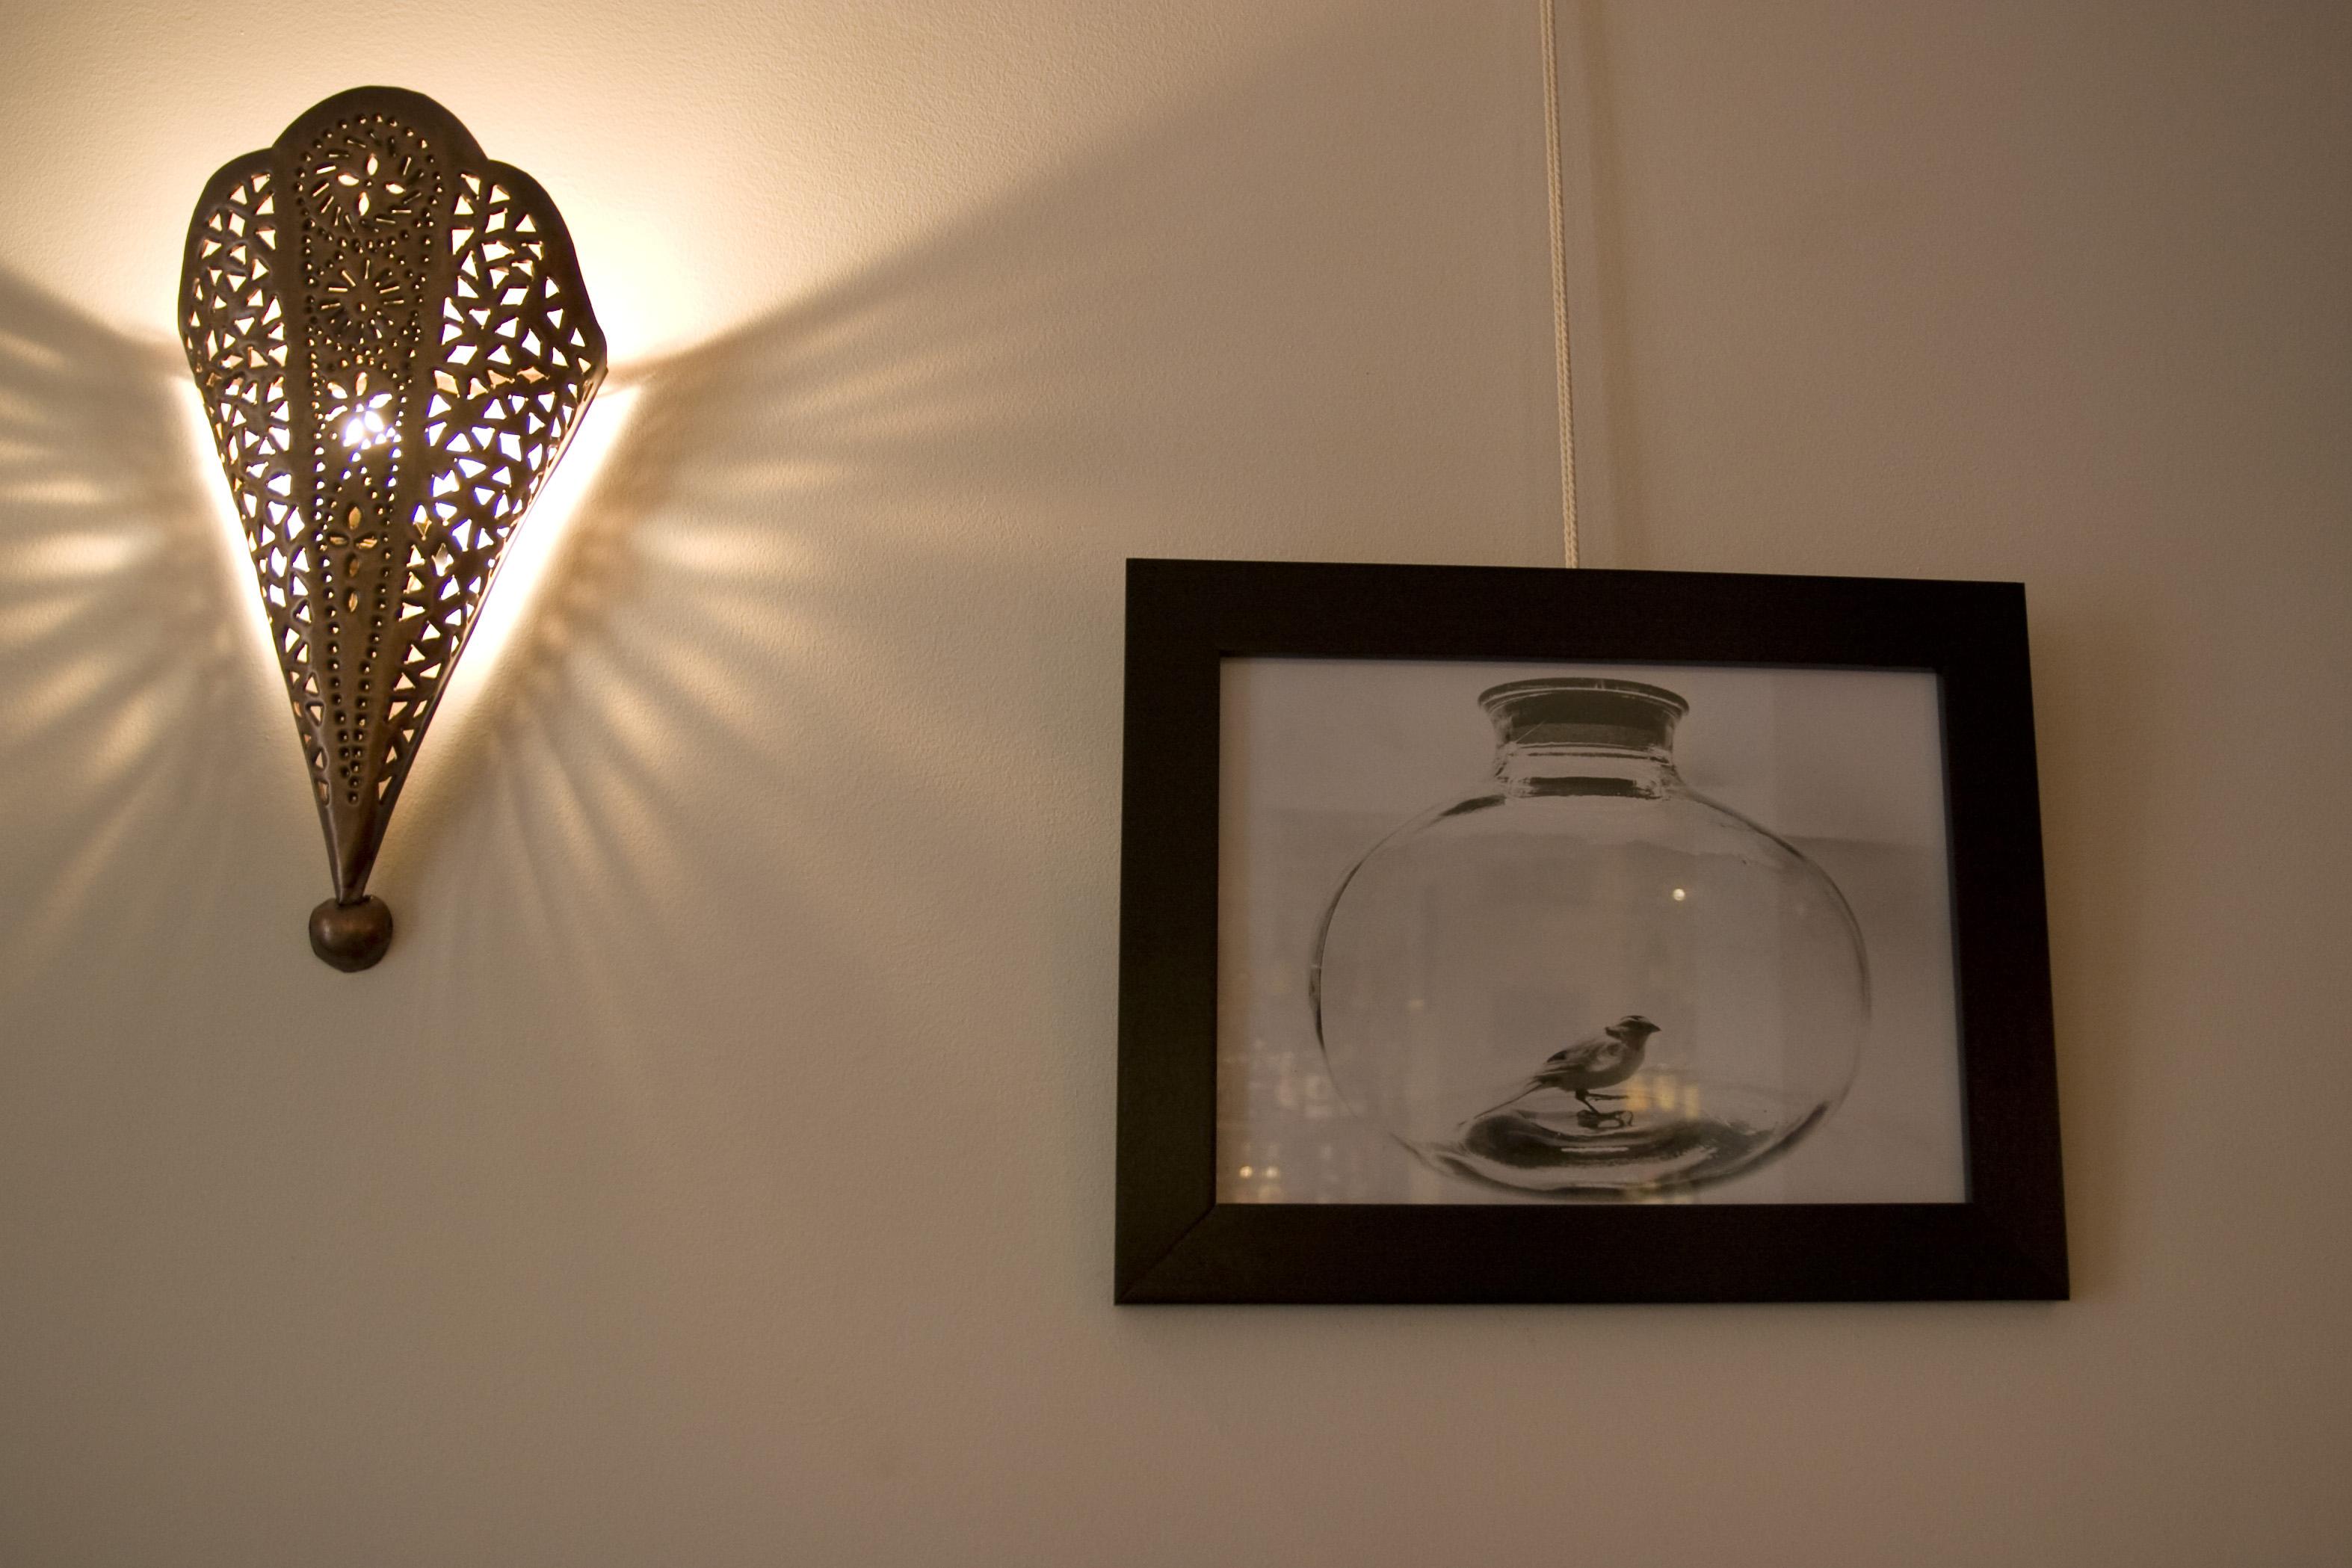 Café Aguardiente